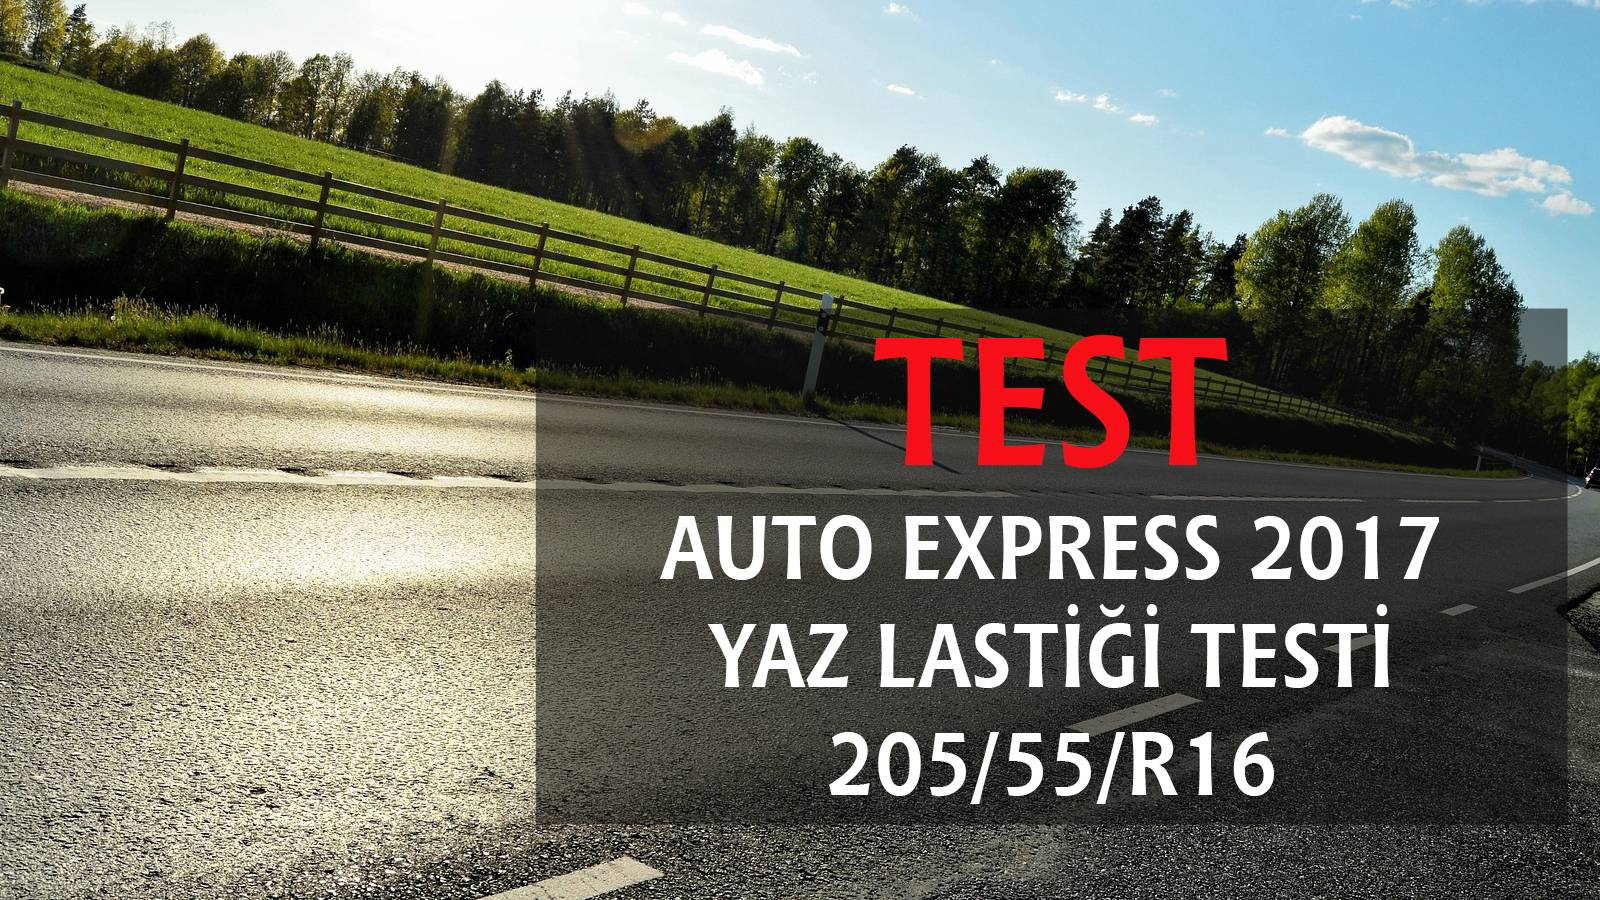 2017 Auto Express Yaz Lastiği Testi 205/55/R16